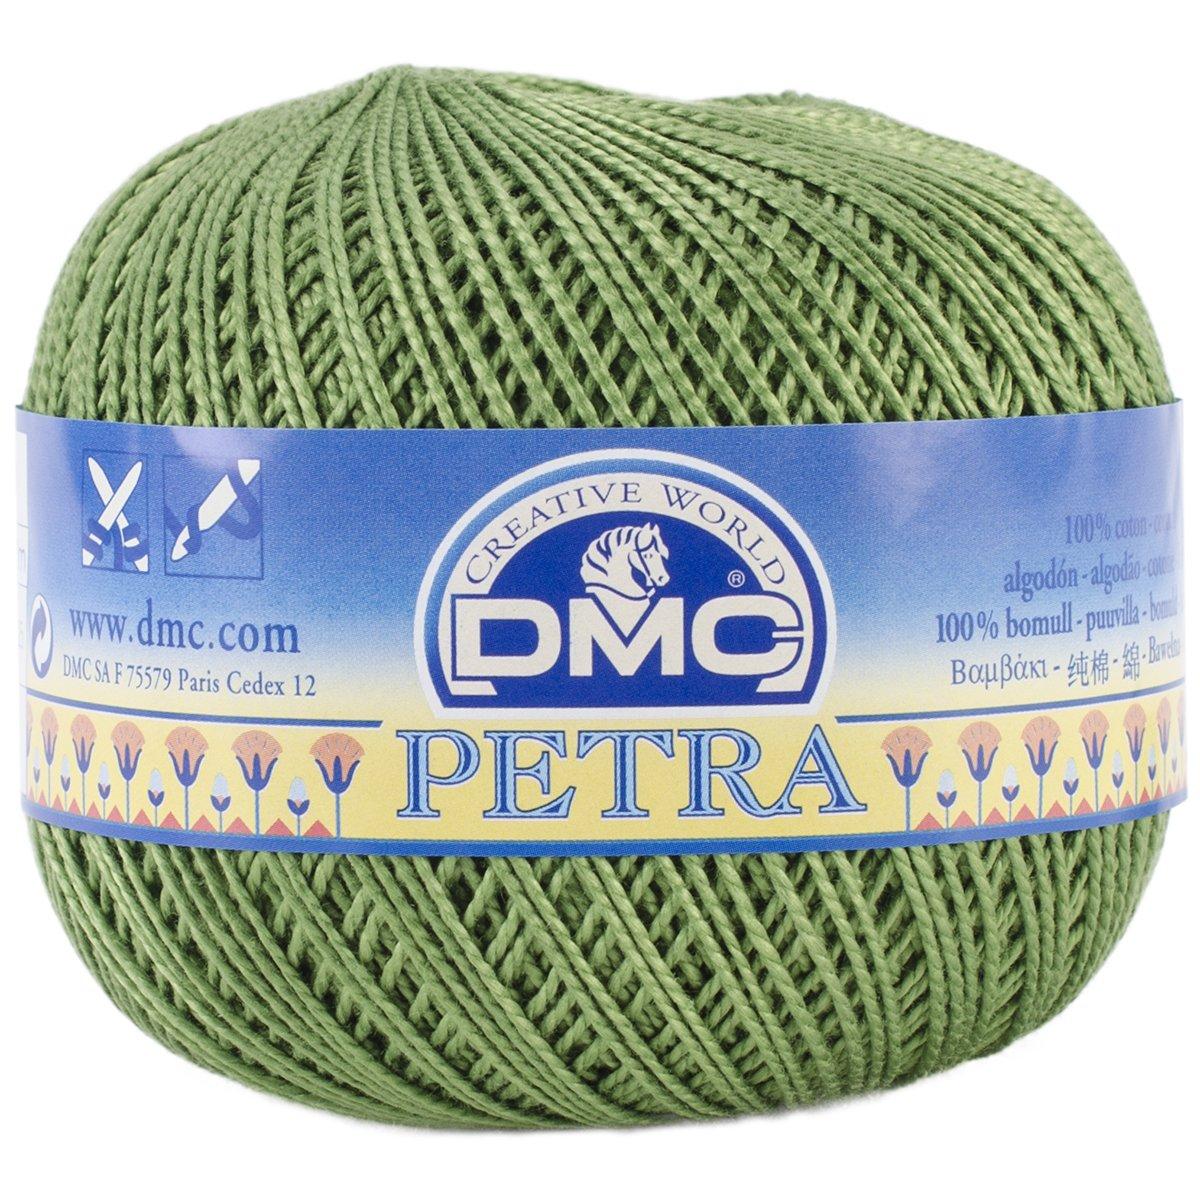 DMC/Petra Crochet Cotton Thread Size 5 331736